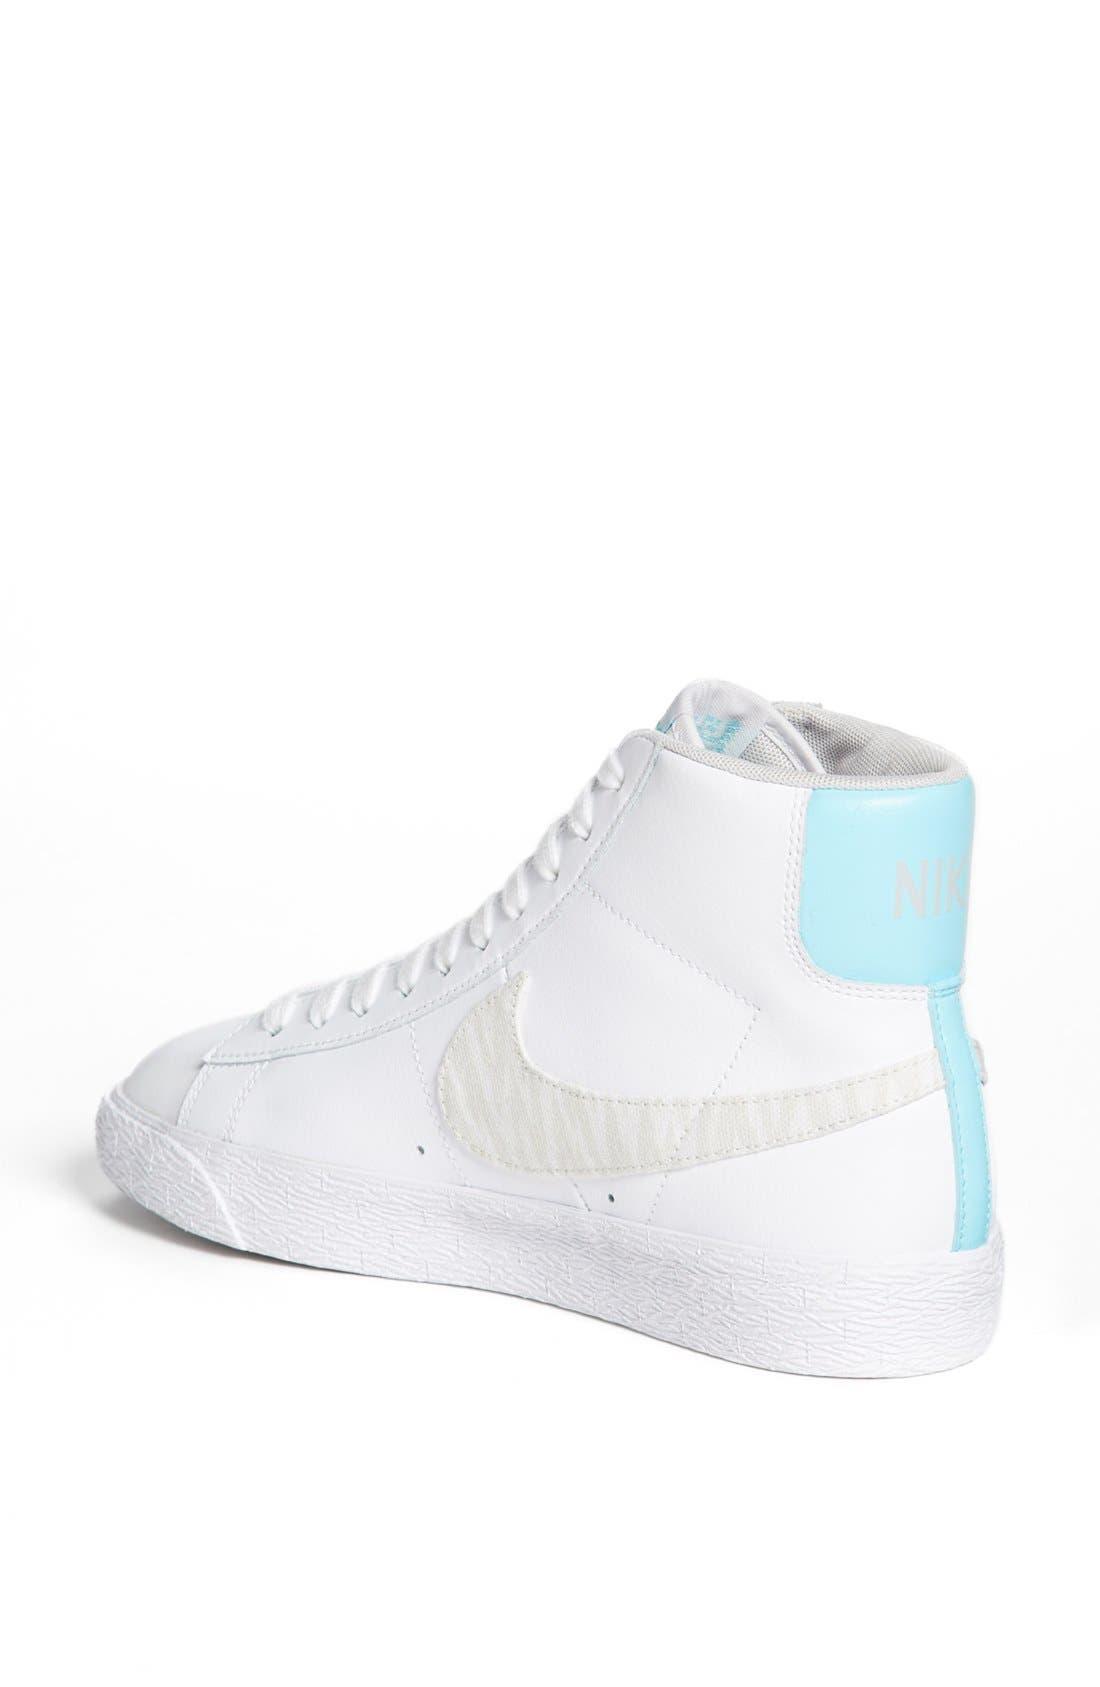 'Blazer' Mid Leather Sneaker,                             Alternate thumbnail 2, color,                             103